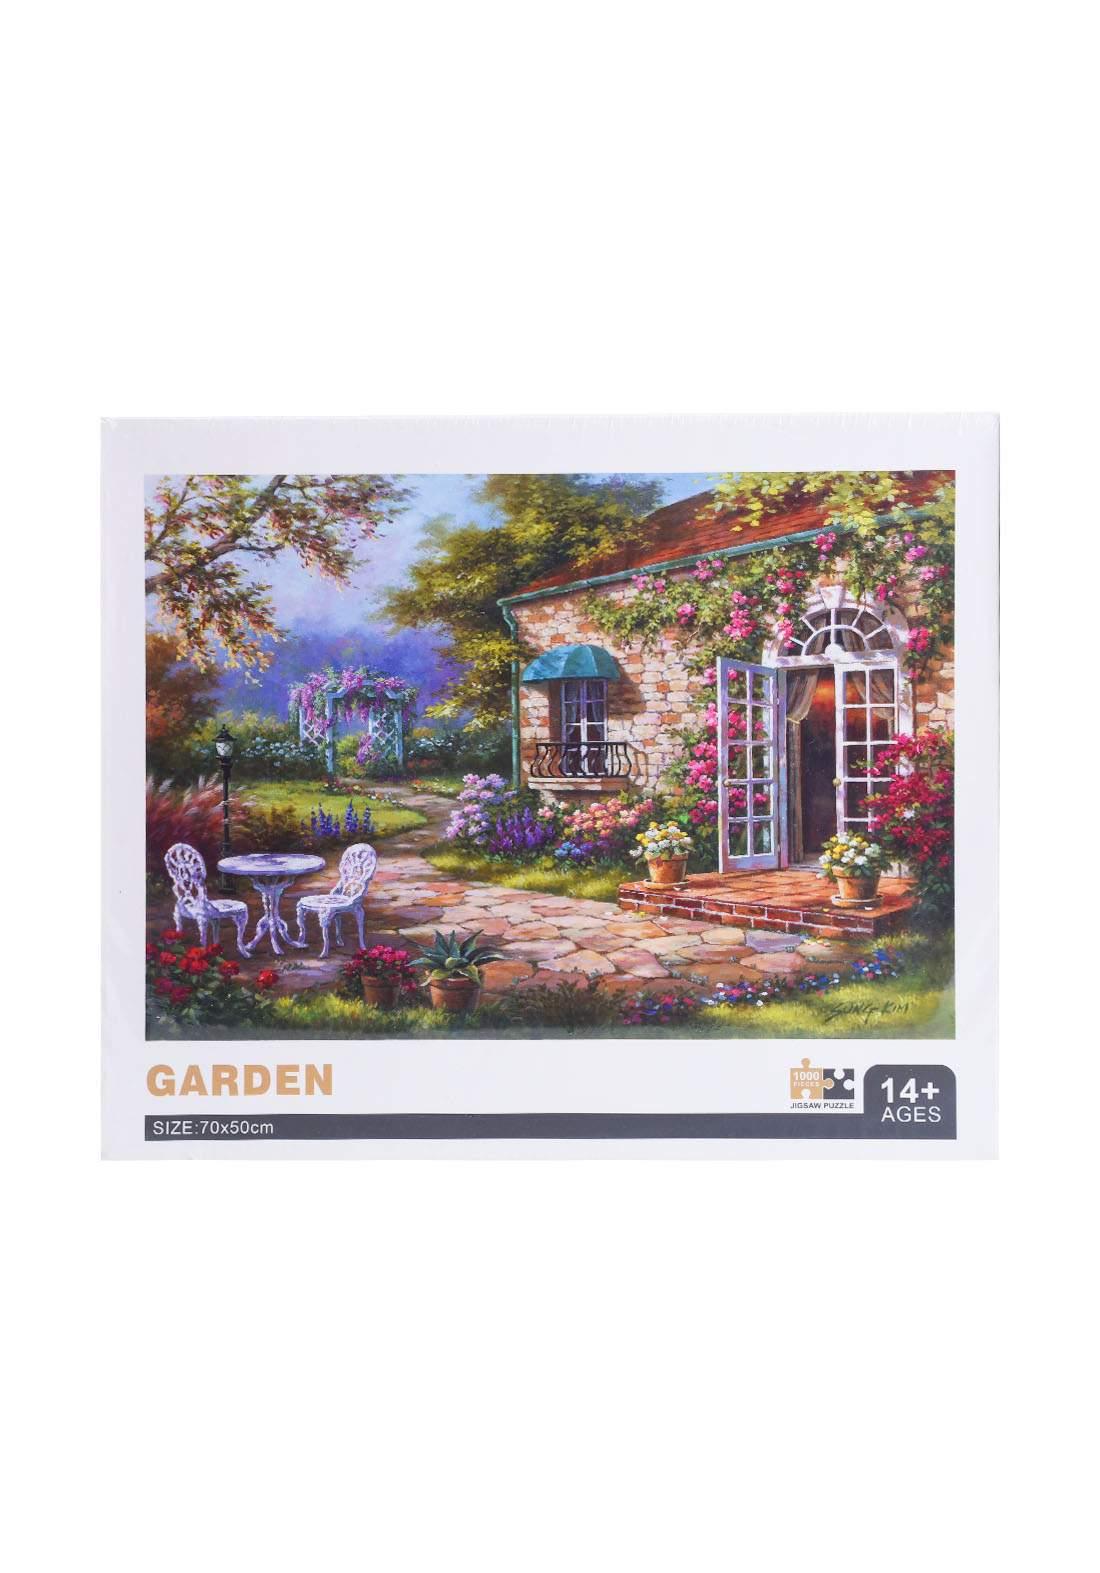 Jigsaw Puzzle Garden 1000Pcs لعبة تركيب القطع بشكل حديقة